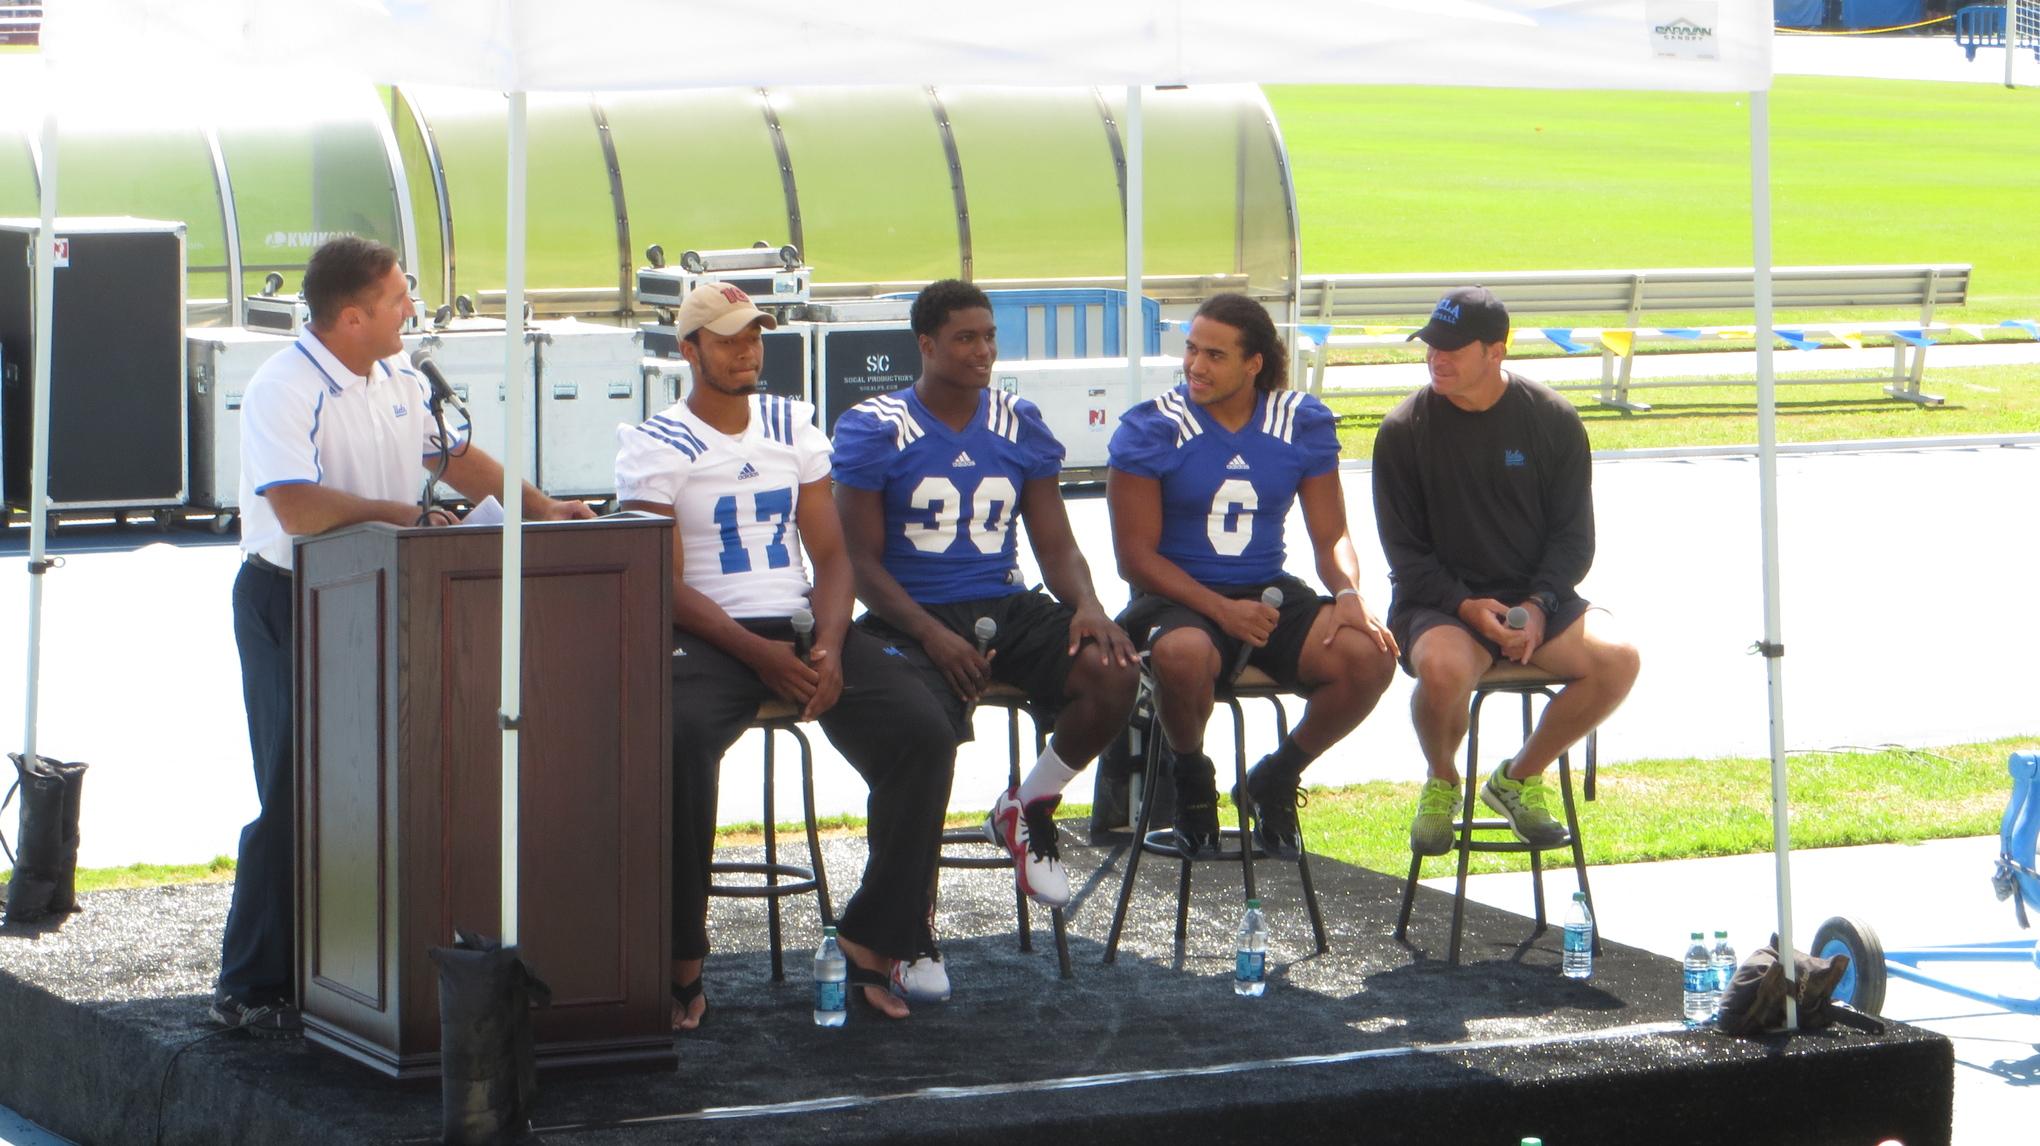 Matt Stevens led the panel discussion featuring Coach Mora, Brett Hundley, Eric Kendricks and Myles Jack